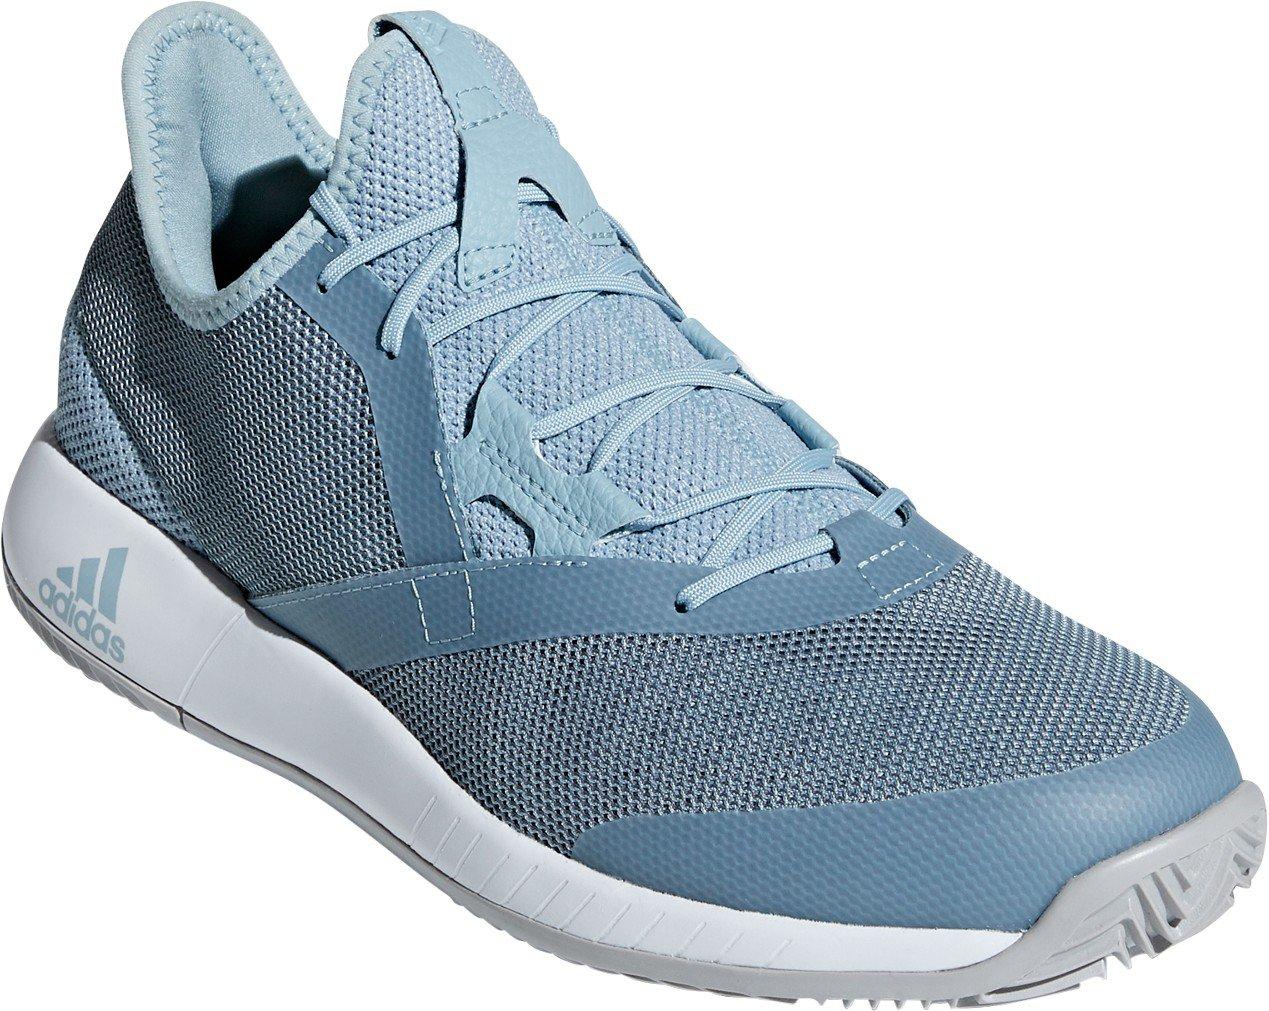 04a1c43e564708 Display product reviews for adidas Men's adizero Defiant Bounce Tennis Shoes